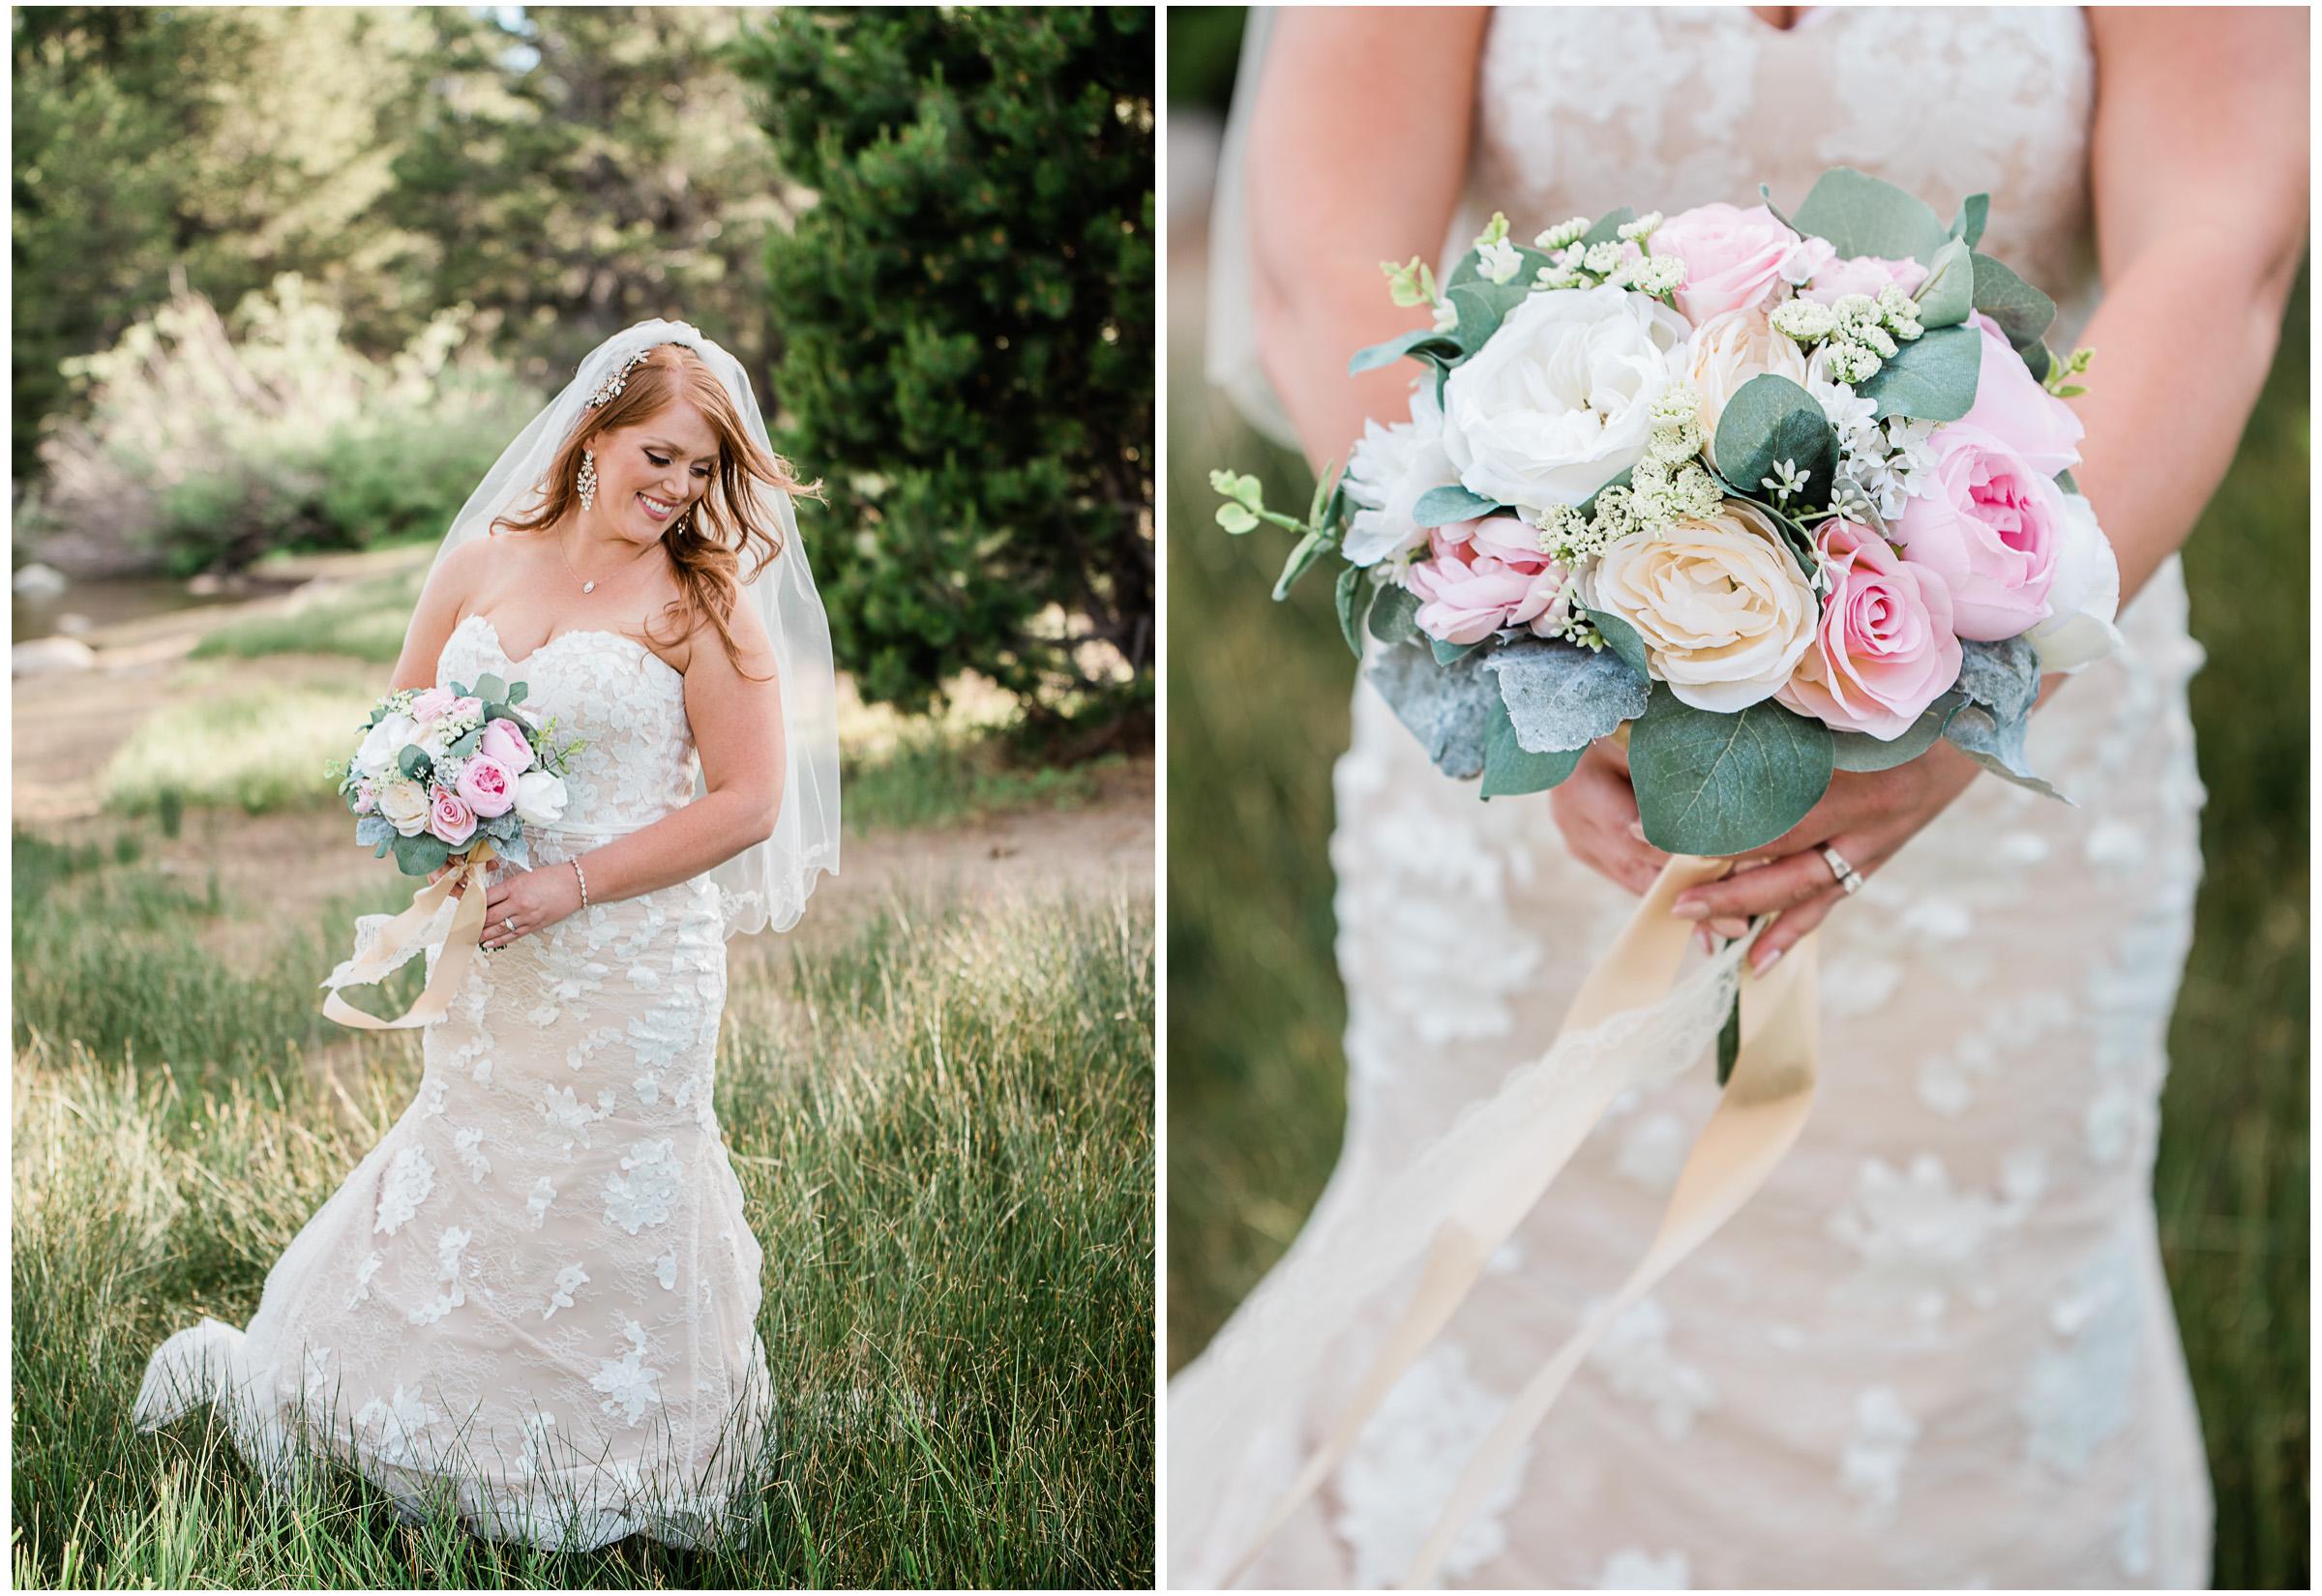 Clarksburg Wedding - Sacramento Photographer - Bogle Winery - Justin Wilcox Photography - 4.jpg